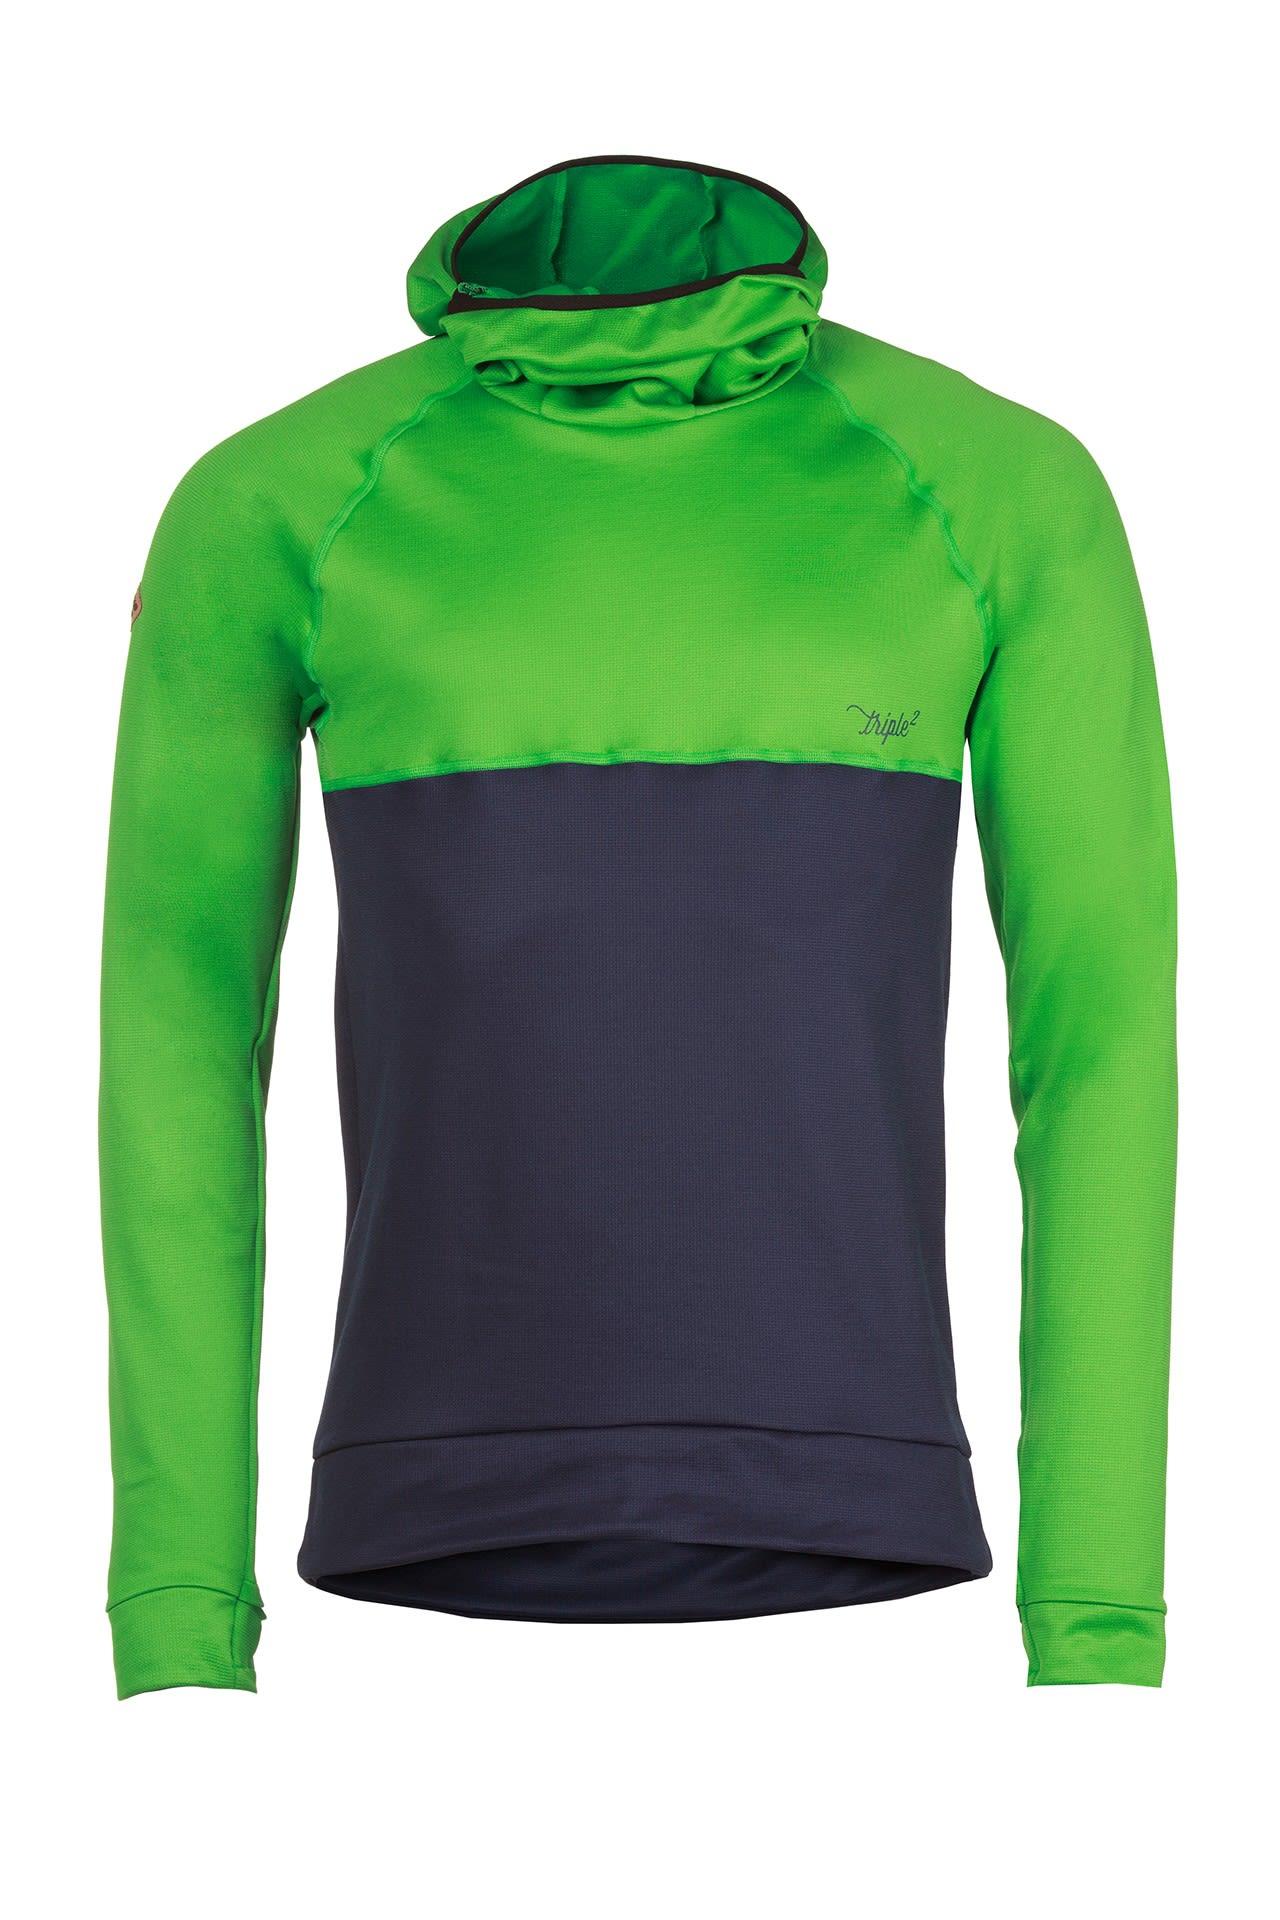 Triple2 Kapp Merino Storm Hoodie Grün, Male Merino Sweaters & Hoodies, XL